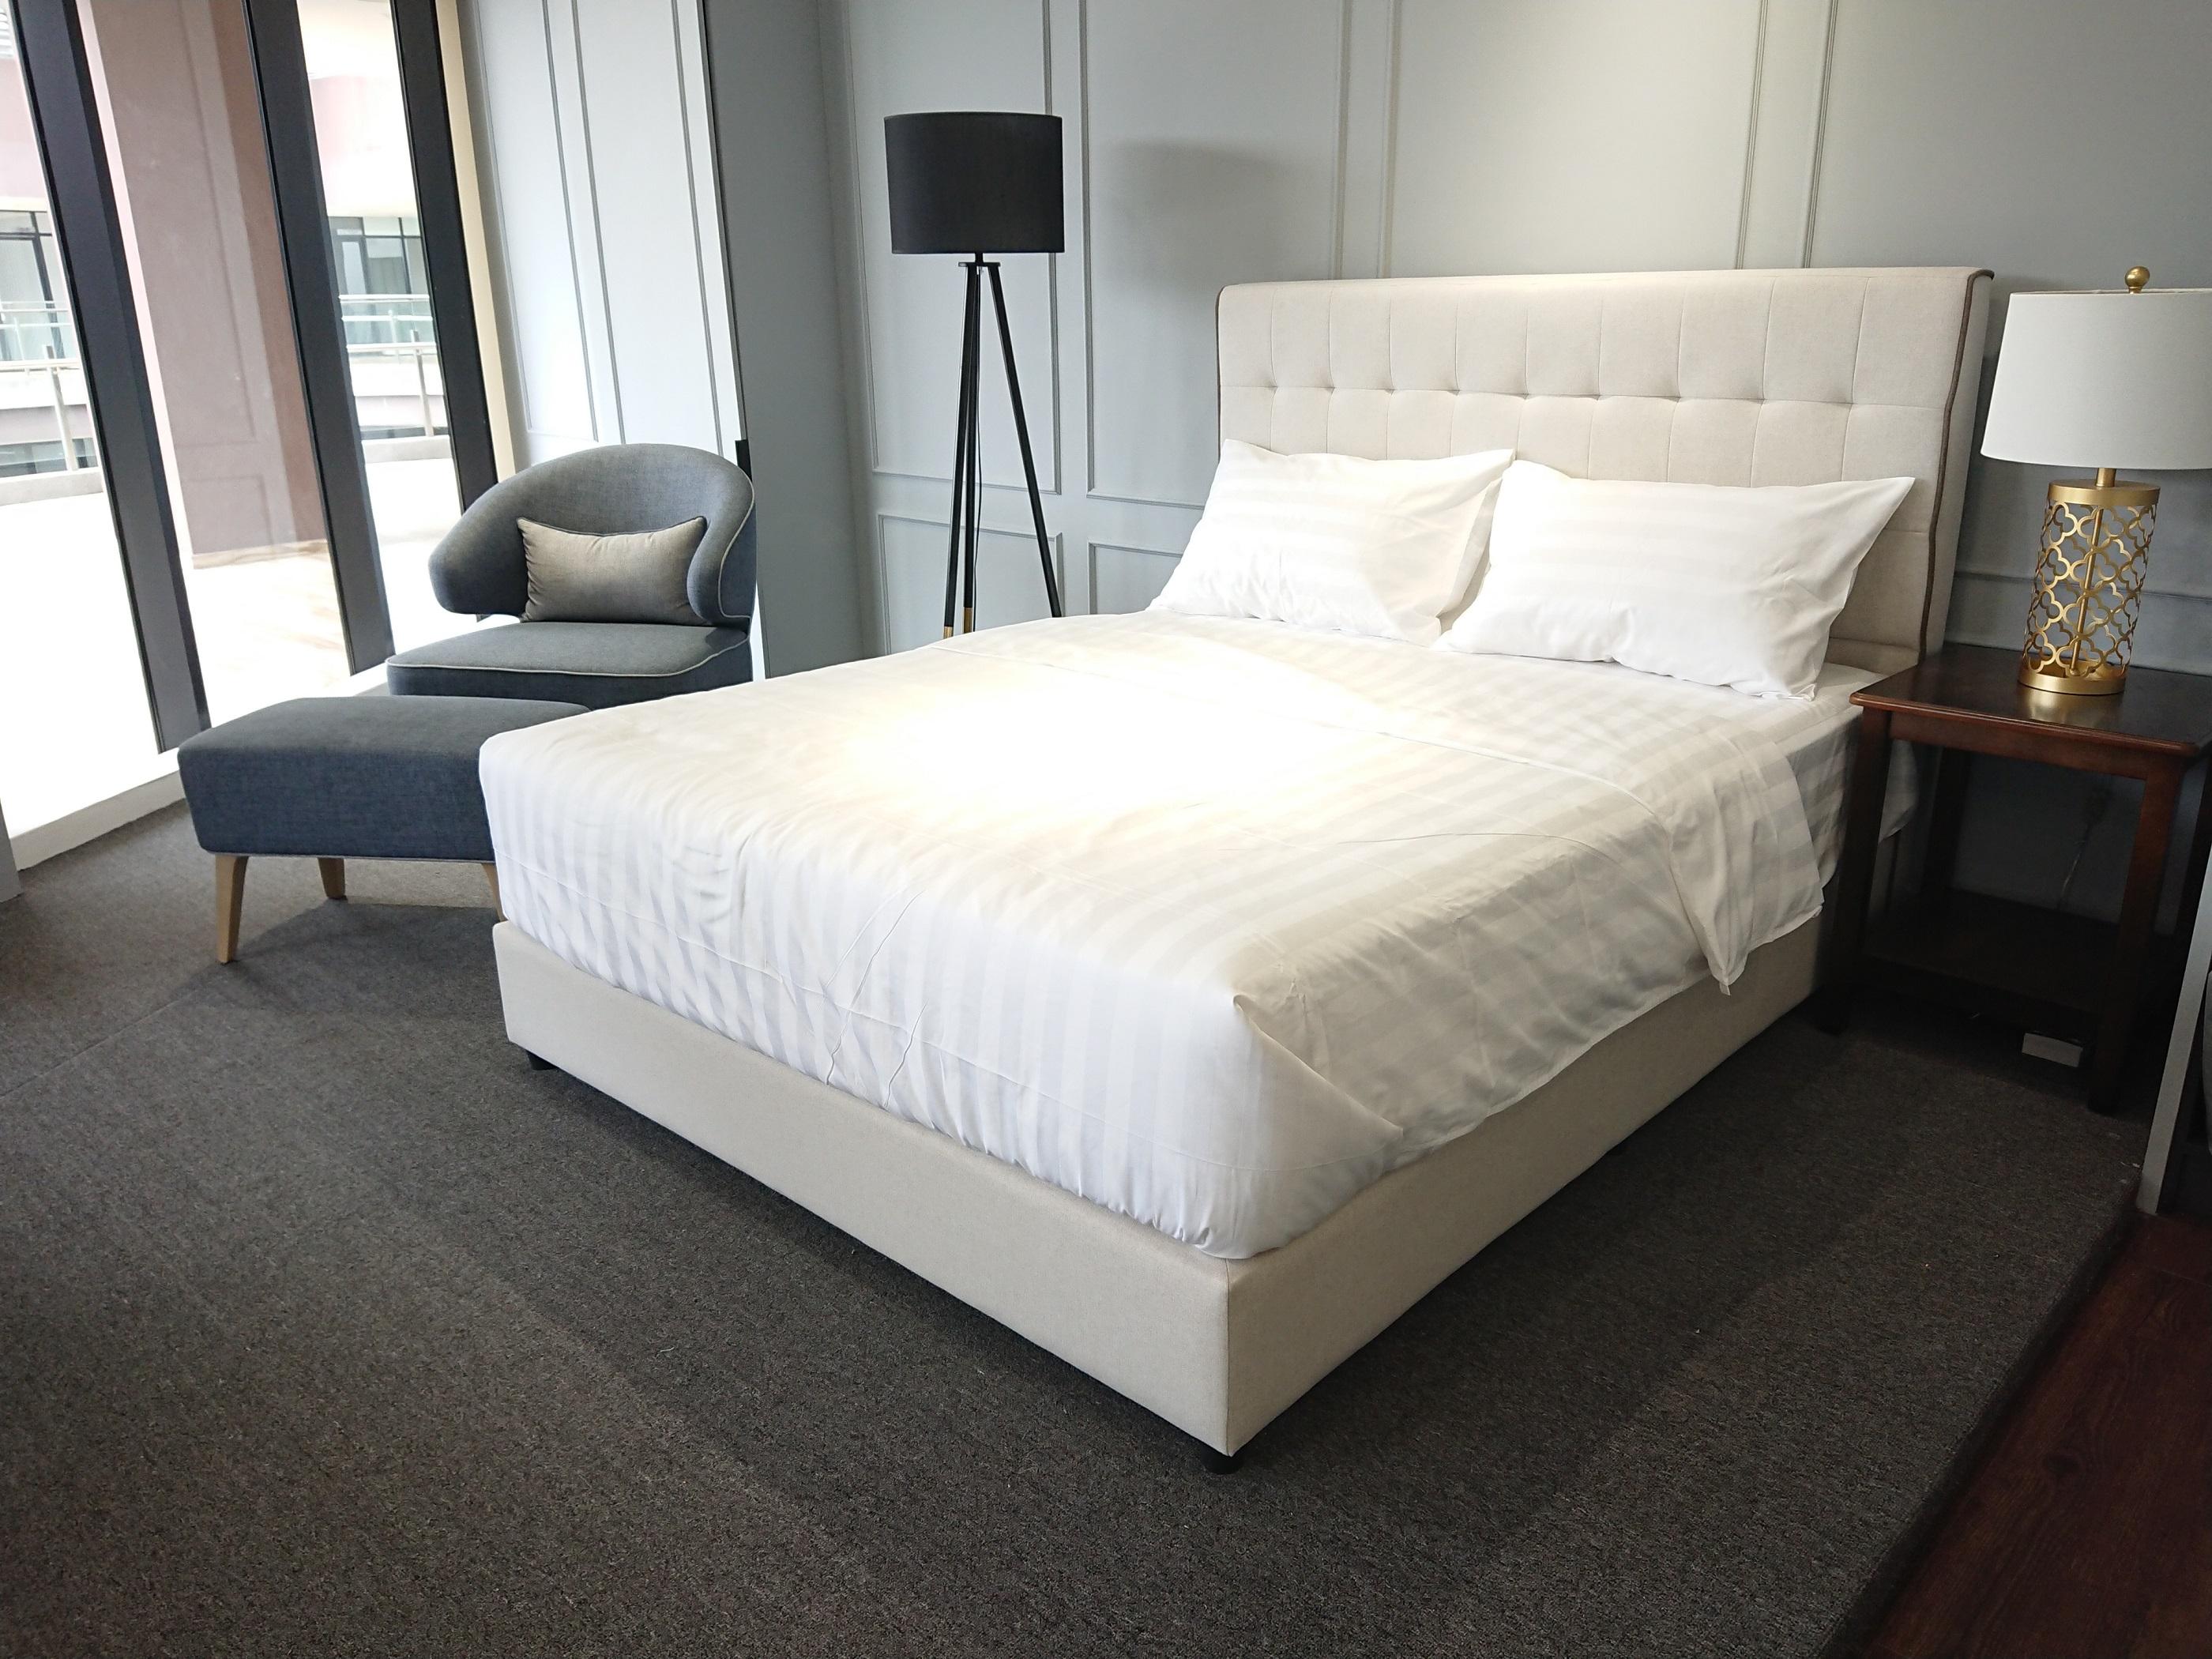 Luxez 3cm Stripe Hotel Bed Linen Bed Sheet Duvet Cover Pillow Case